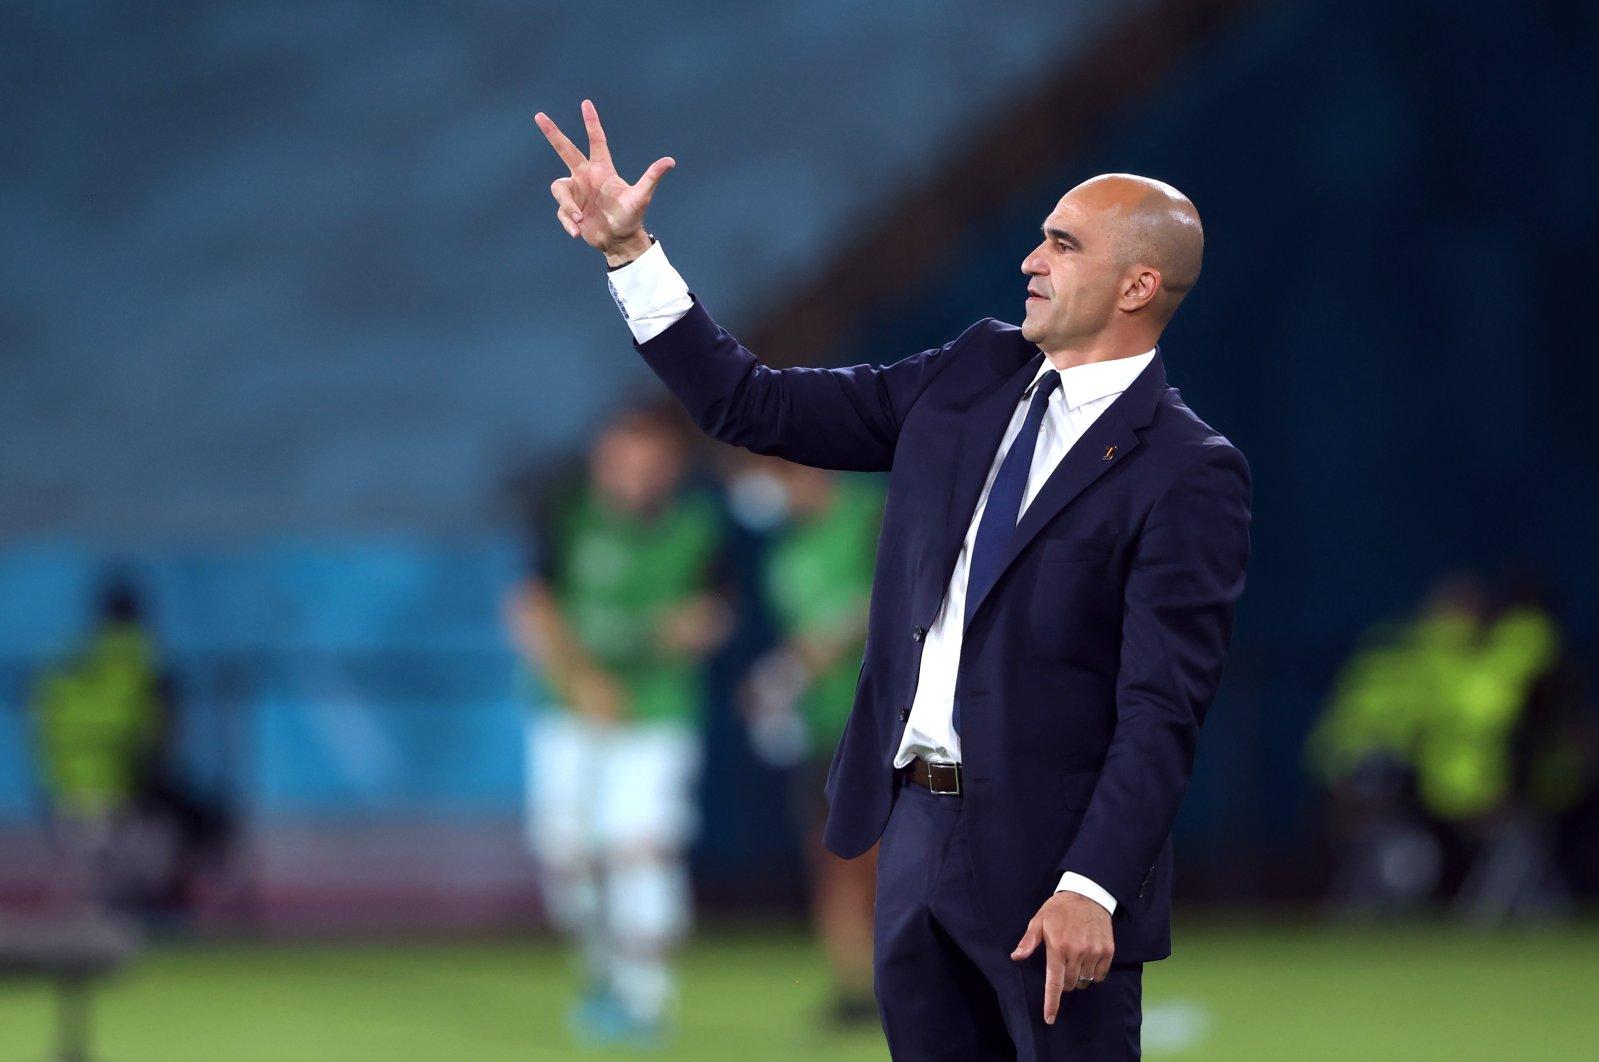 Belgium coach Roberto Martinez reacts during his side's Euro 2020, round of 16 match against Portugal, La Cartuja Stadium, Seville, Spain, June 27, 2021. (Reuters Photo)